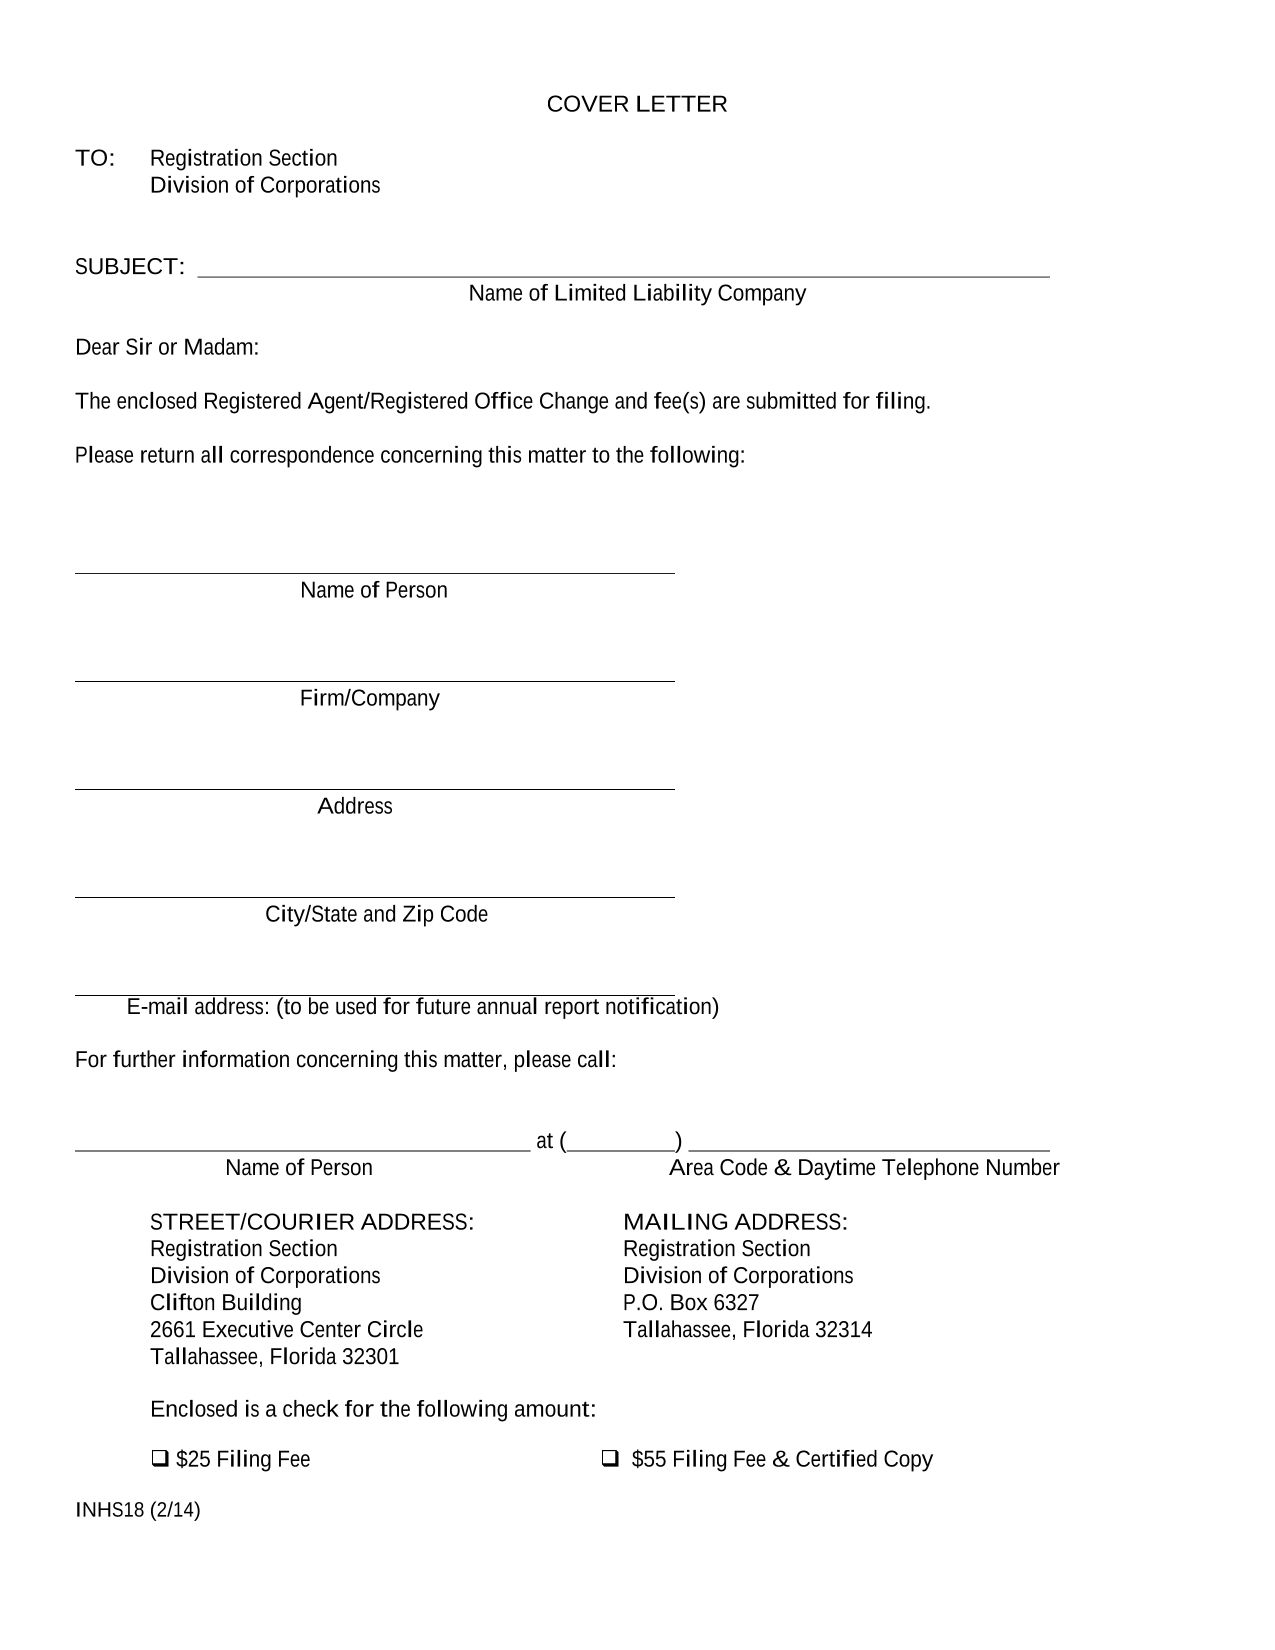 florida-llc-statement-of-change-of-registered-agent